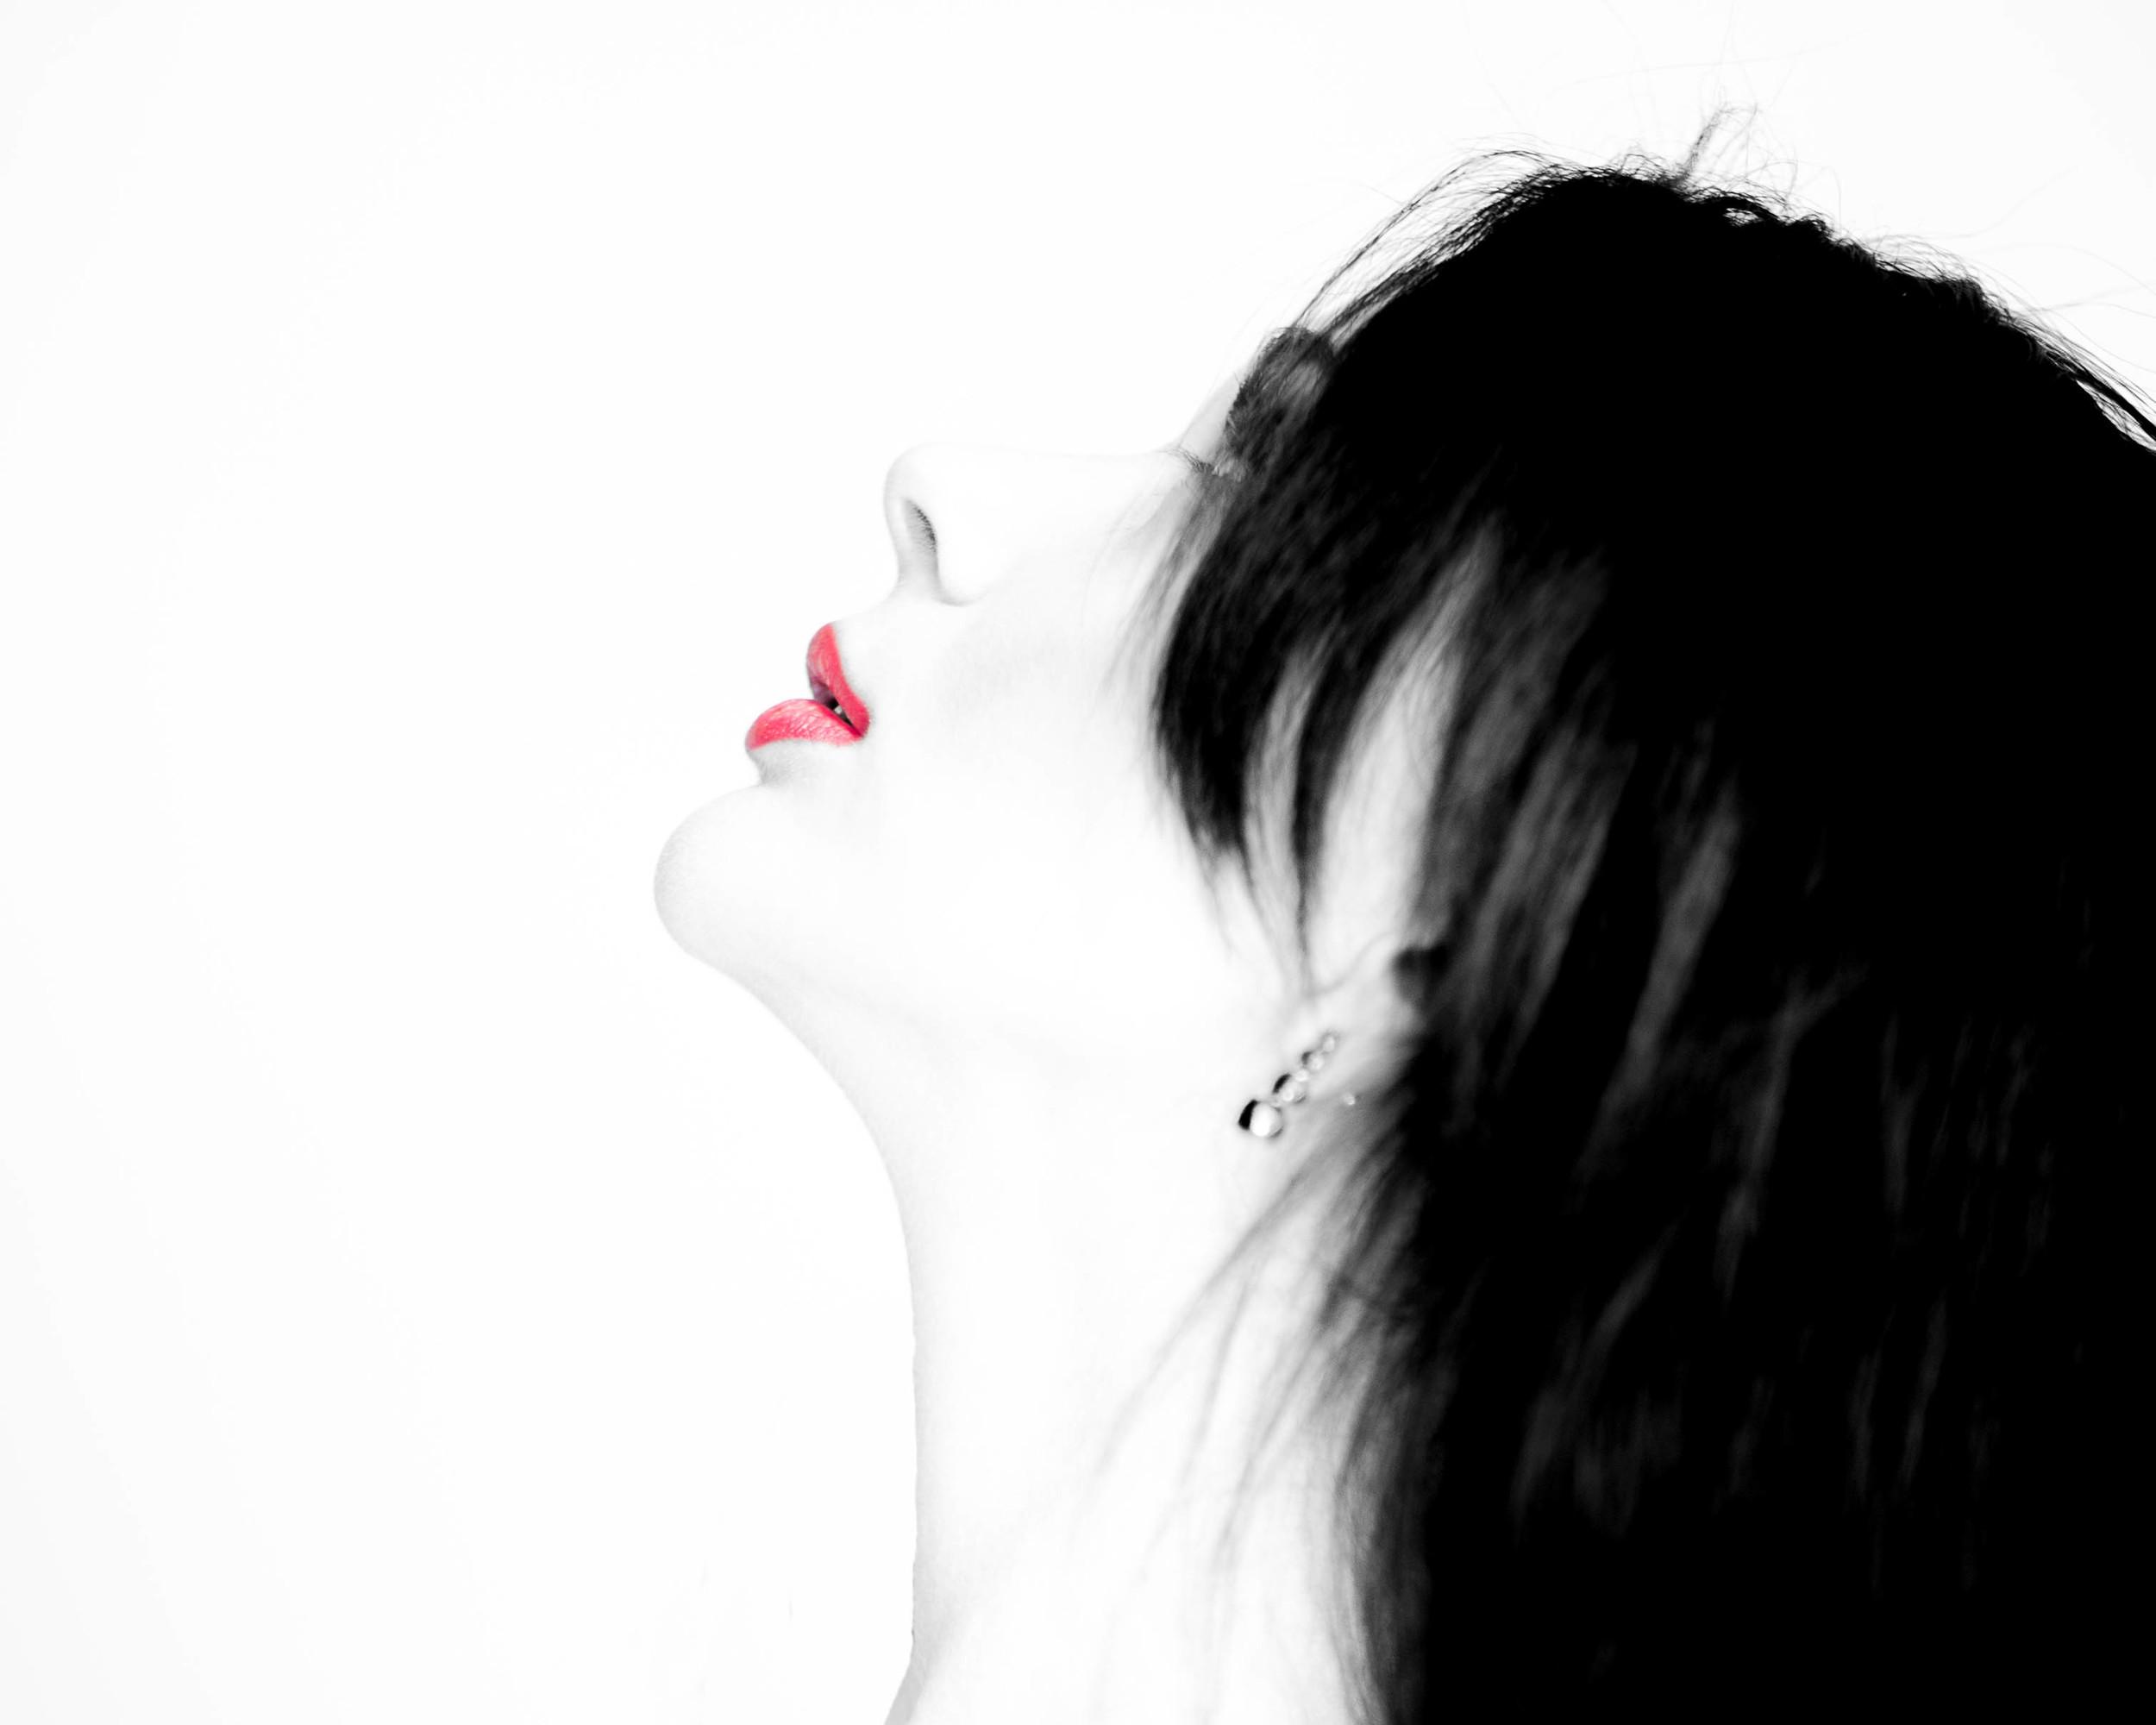 IMG_8555-Edit-1